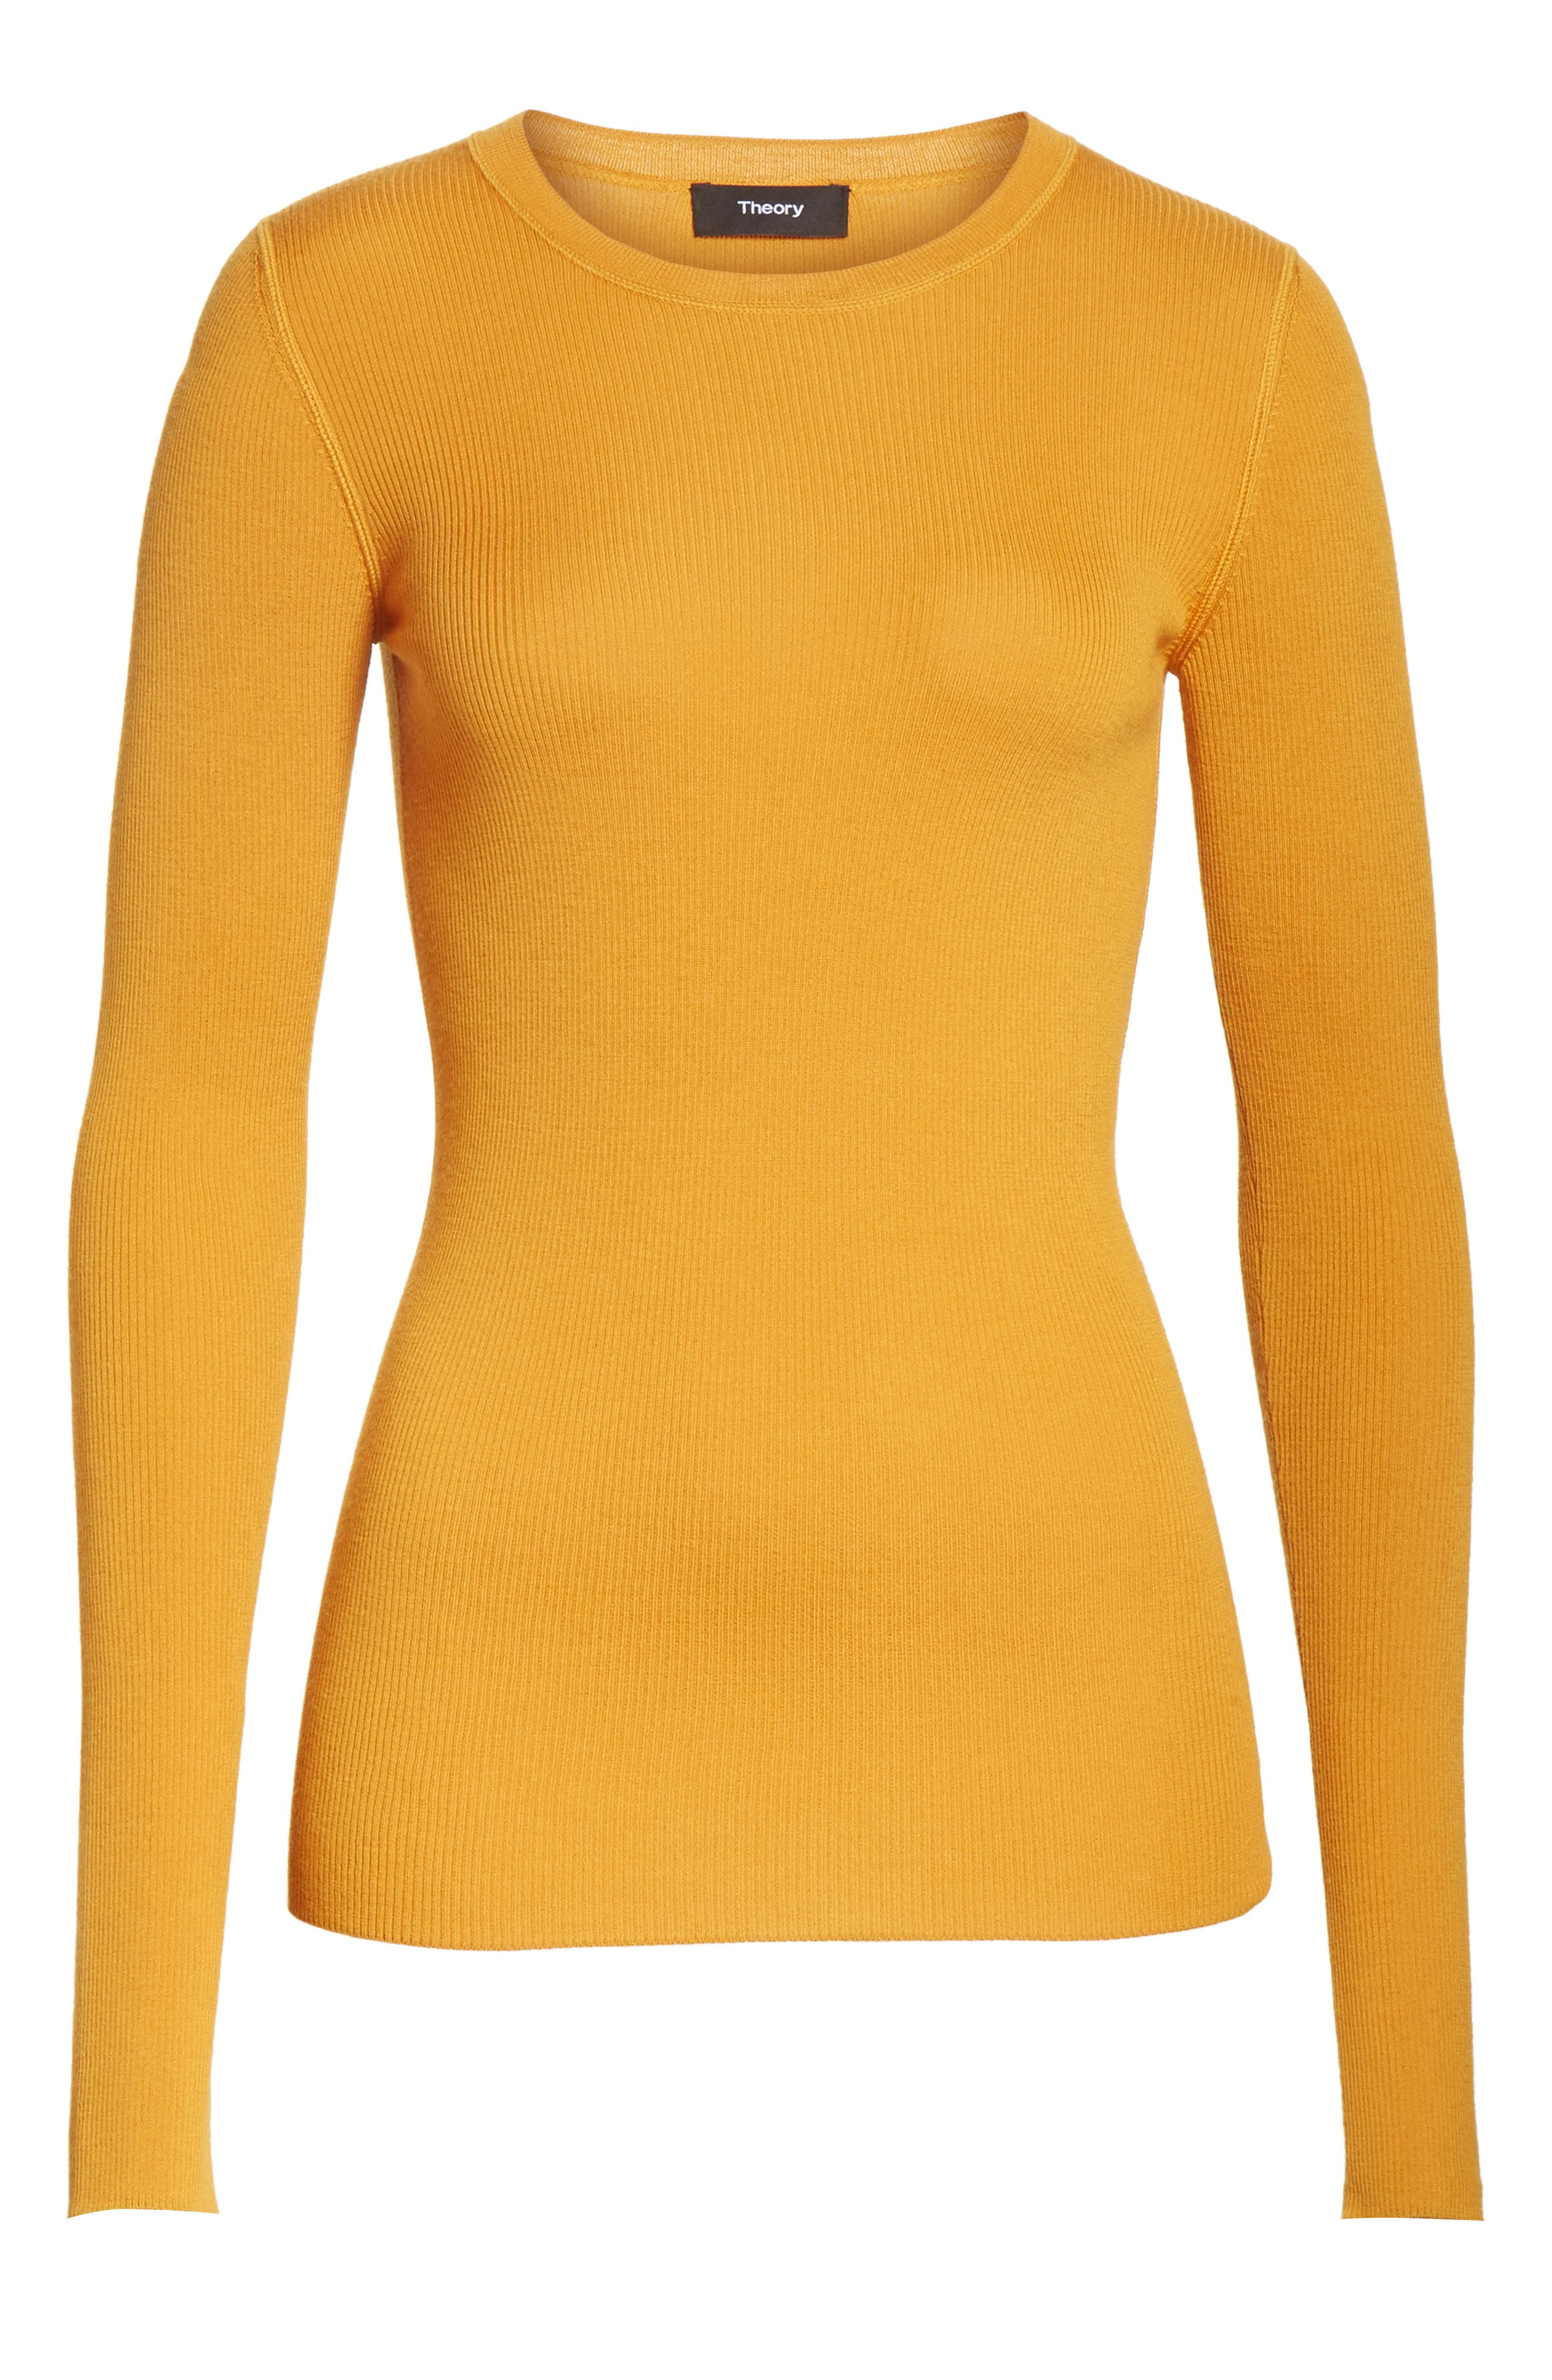 Mirzi Ribbed Sweater,                             Alternate thumbnail 23, color,